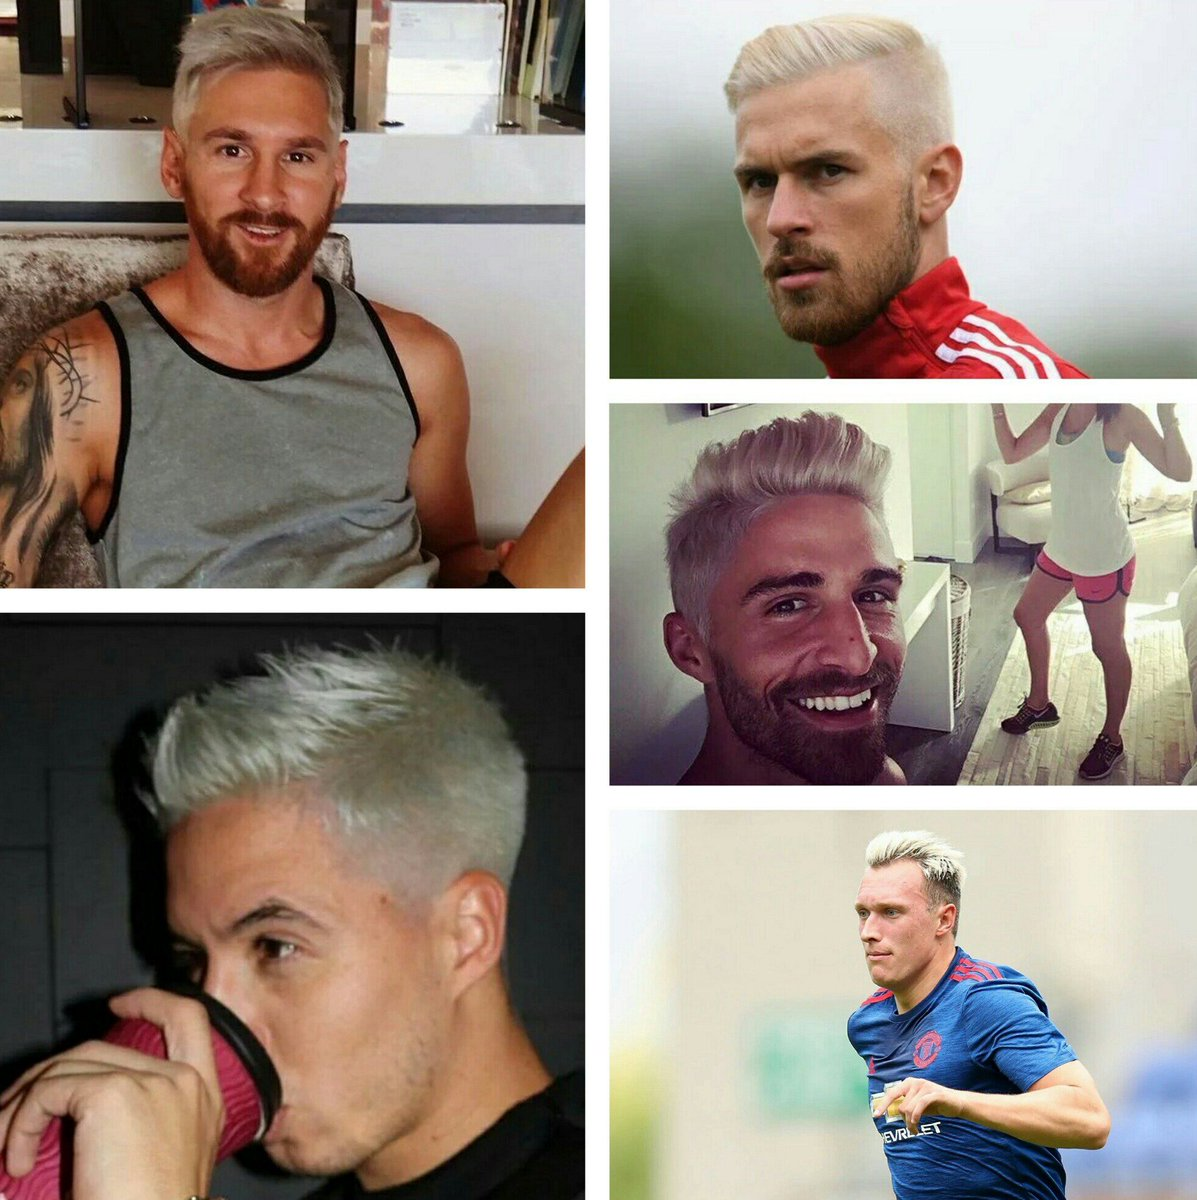 Footy Accumulators On Twitter This Blonde Trend Is Getting